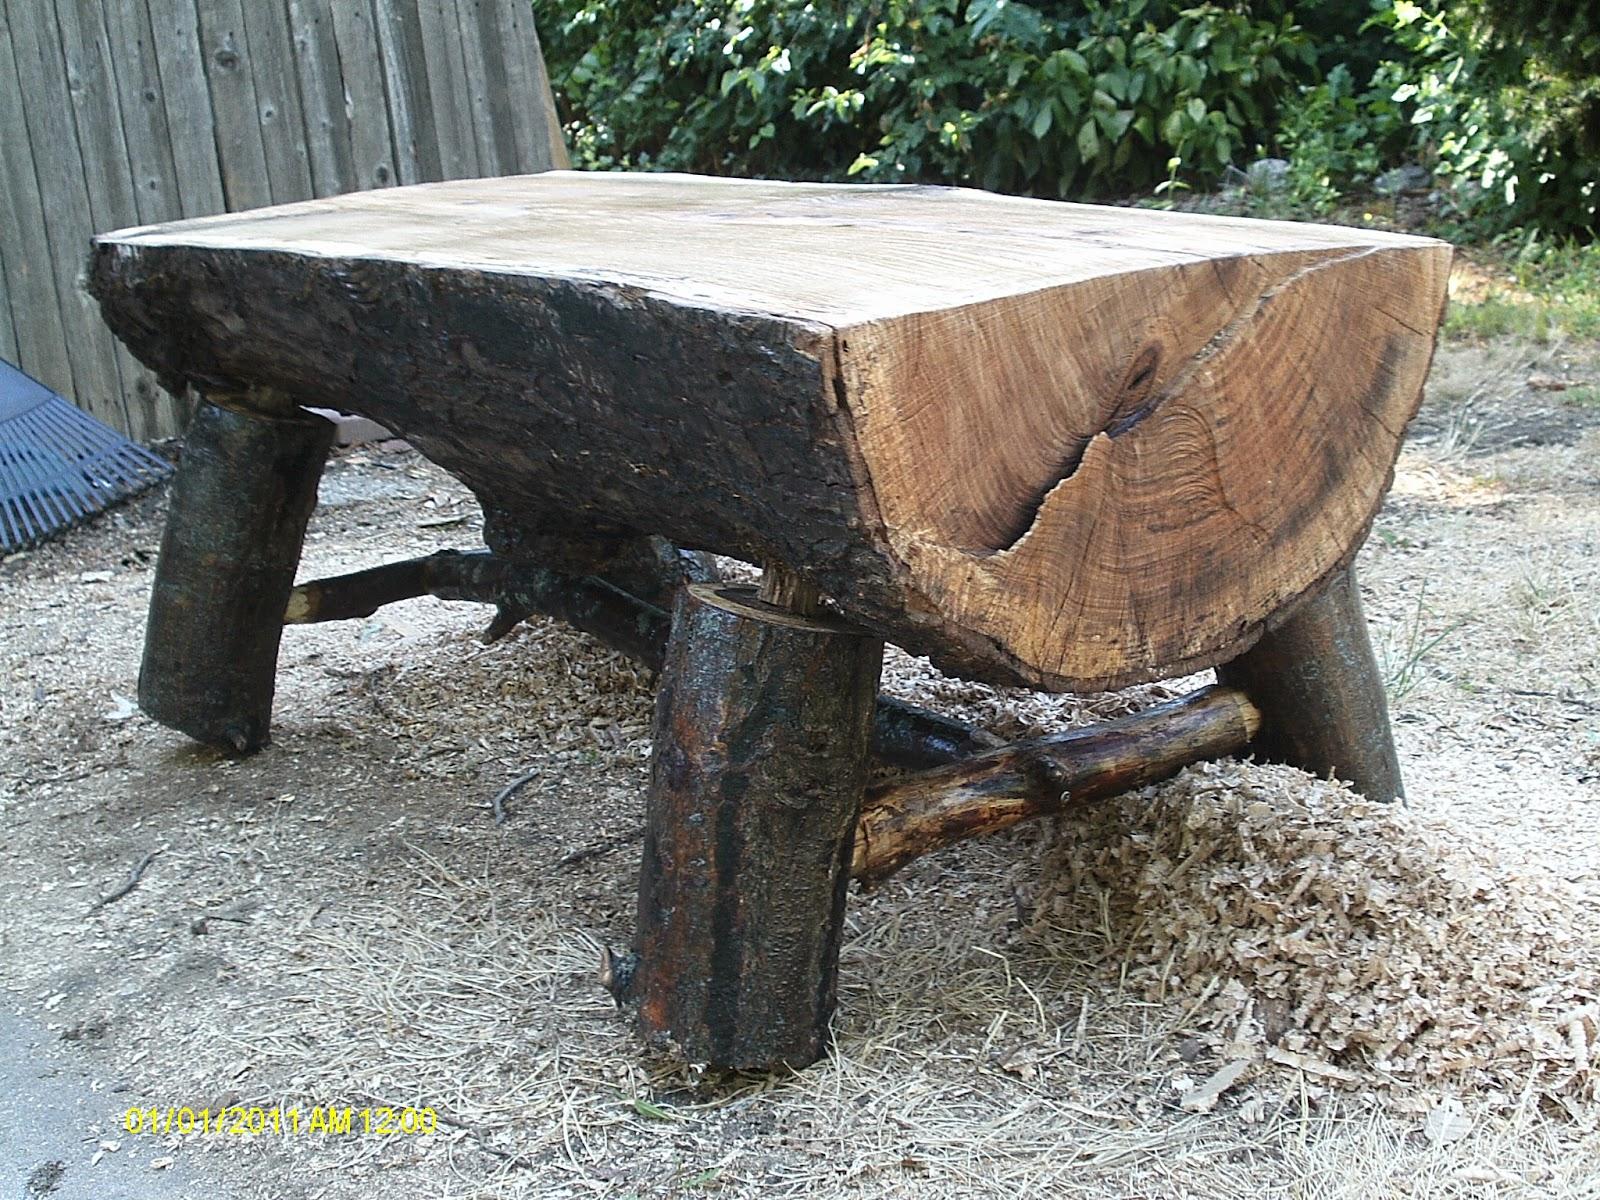 handmade rustic log furniture big fatty bench rh handmadelogfurniture blogspot com Rustic Log Furniture Oak Wood Furniture